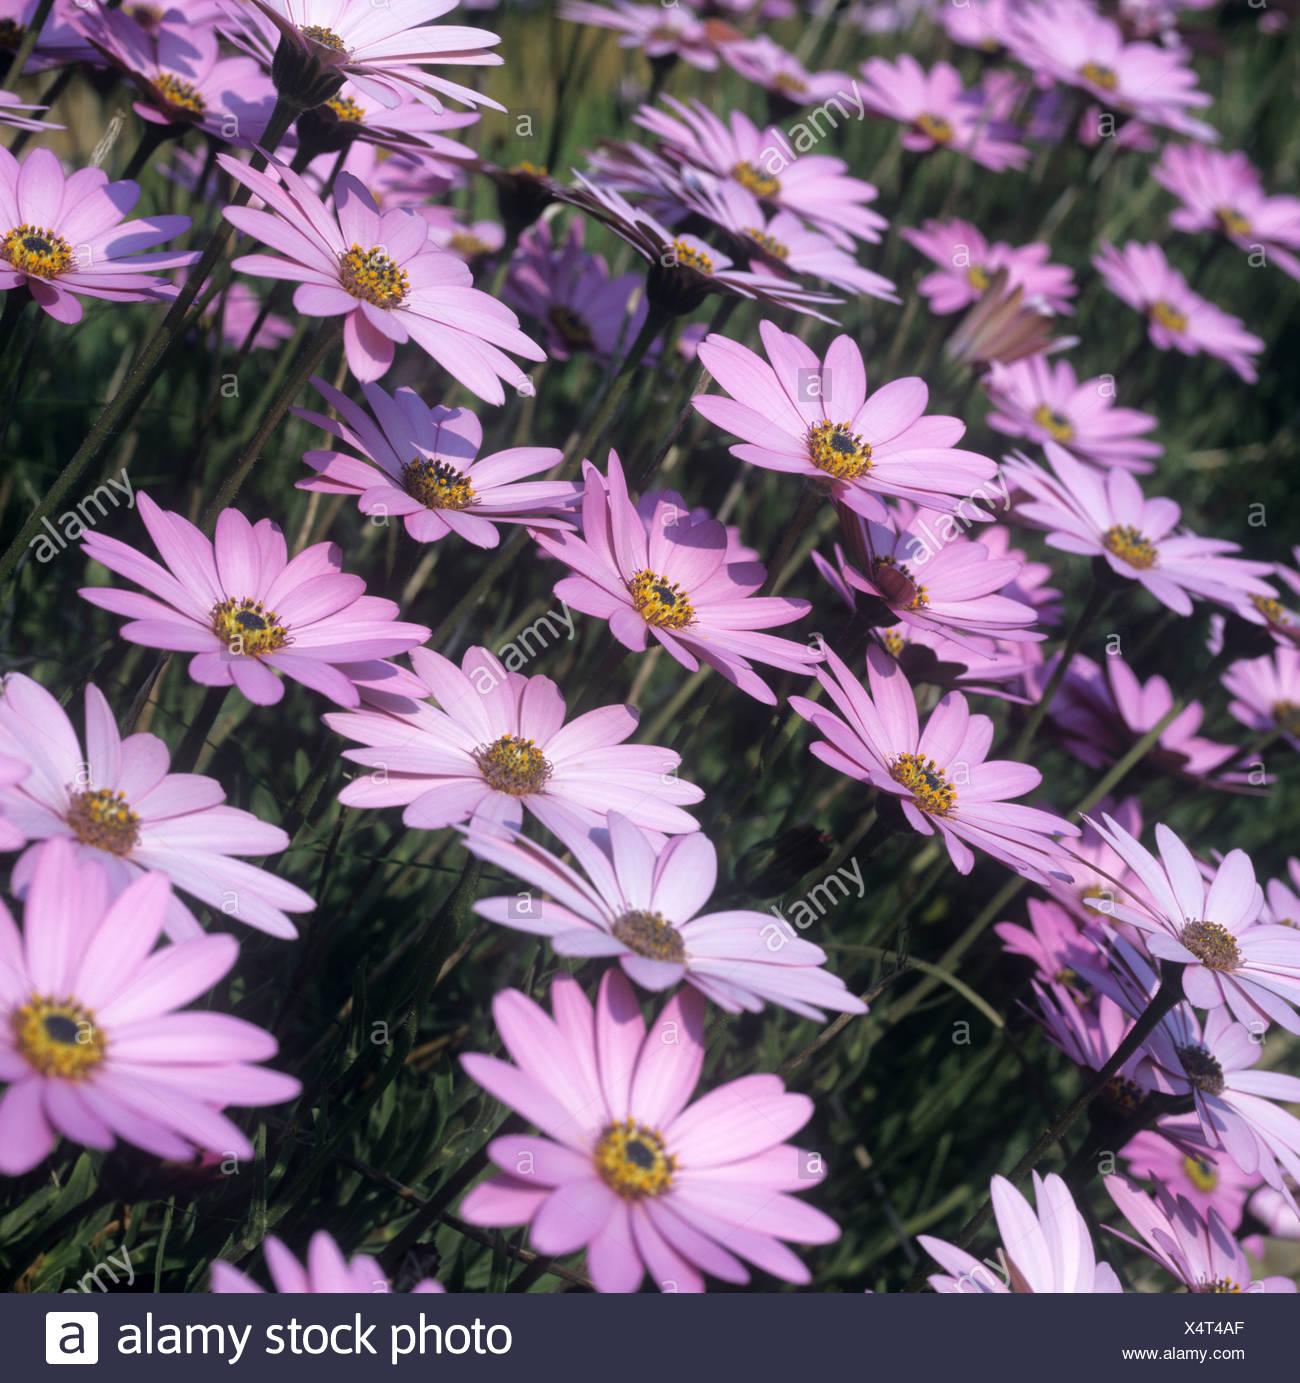 Osteospermum jucundum lilac flowers - Stock Image